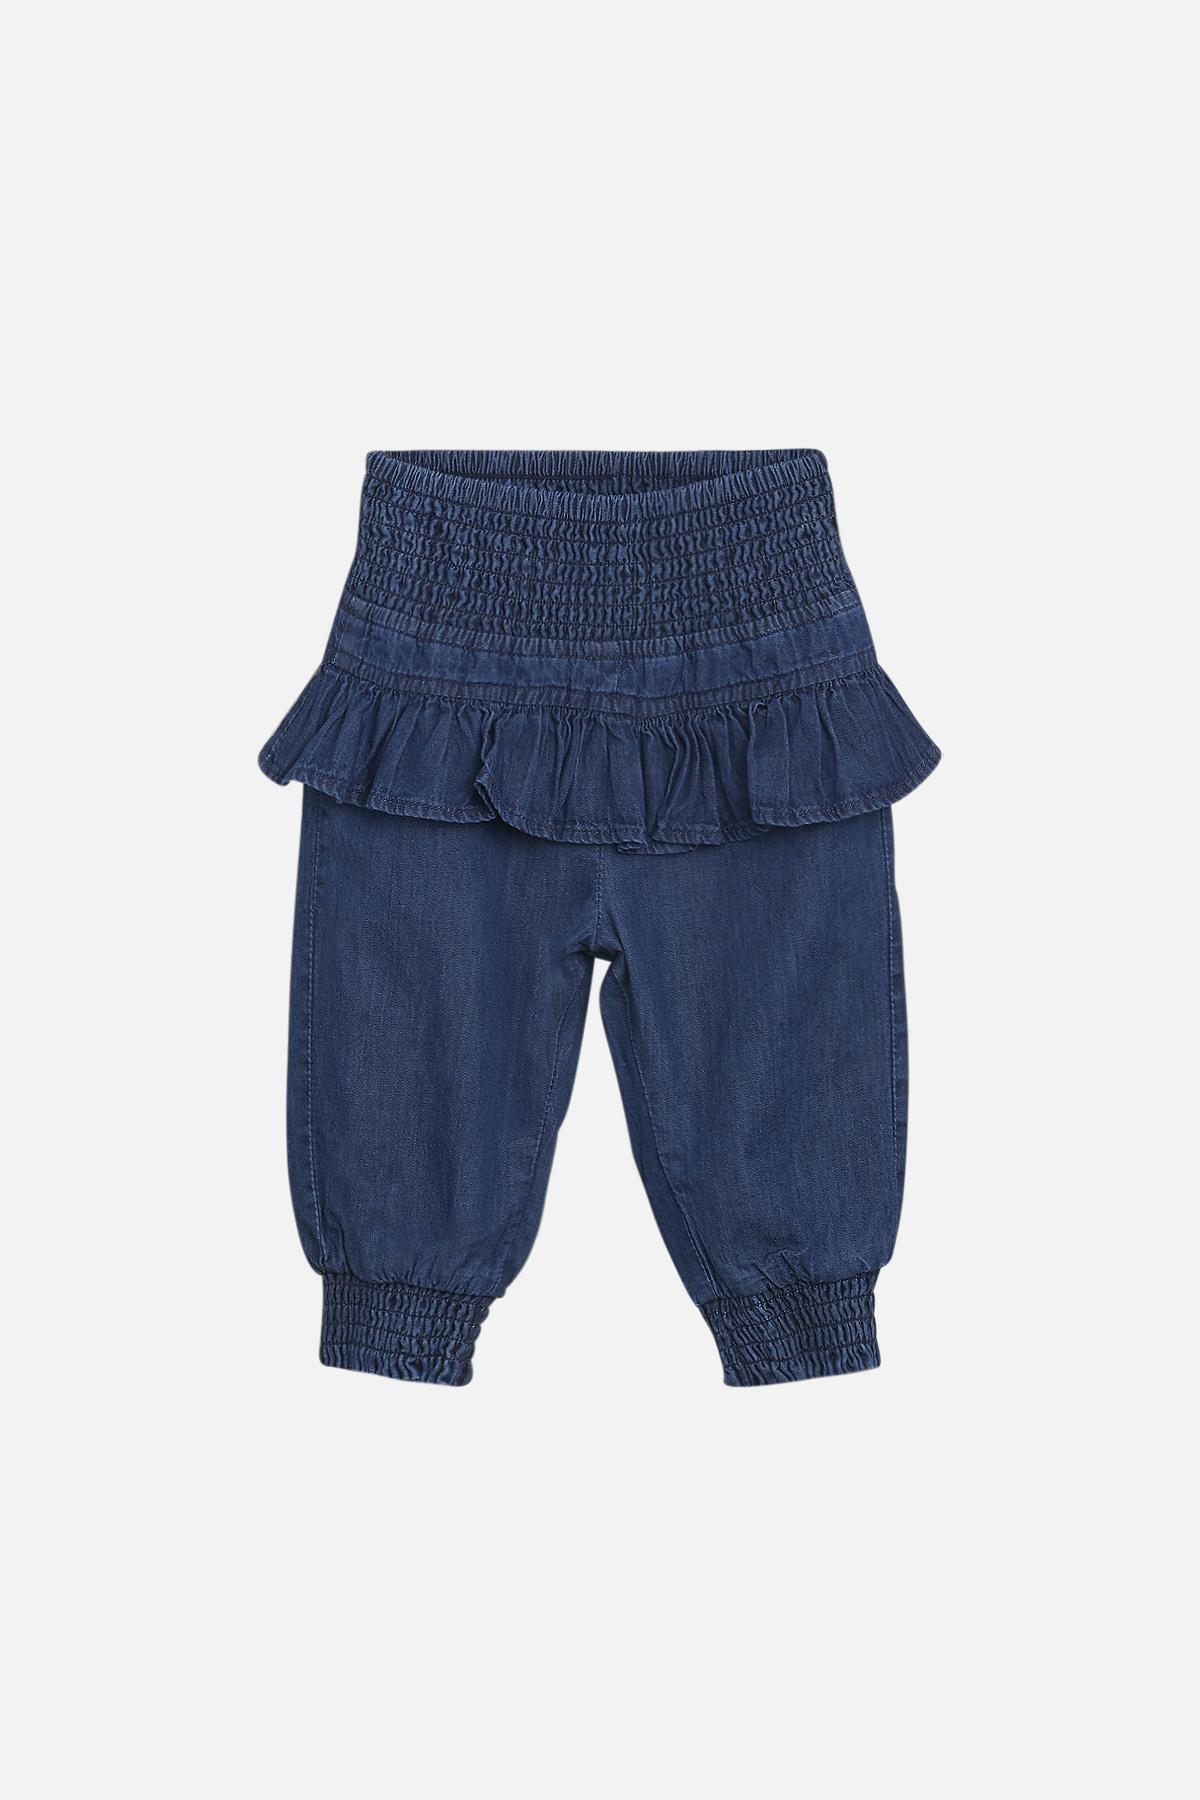 Hust & Claire Trine bukser, denim blue, 80